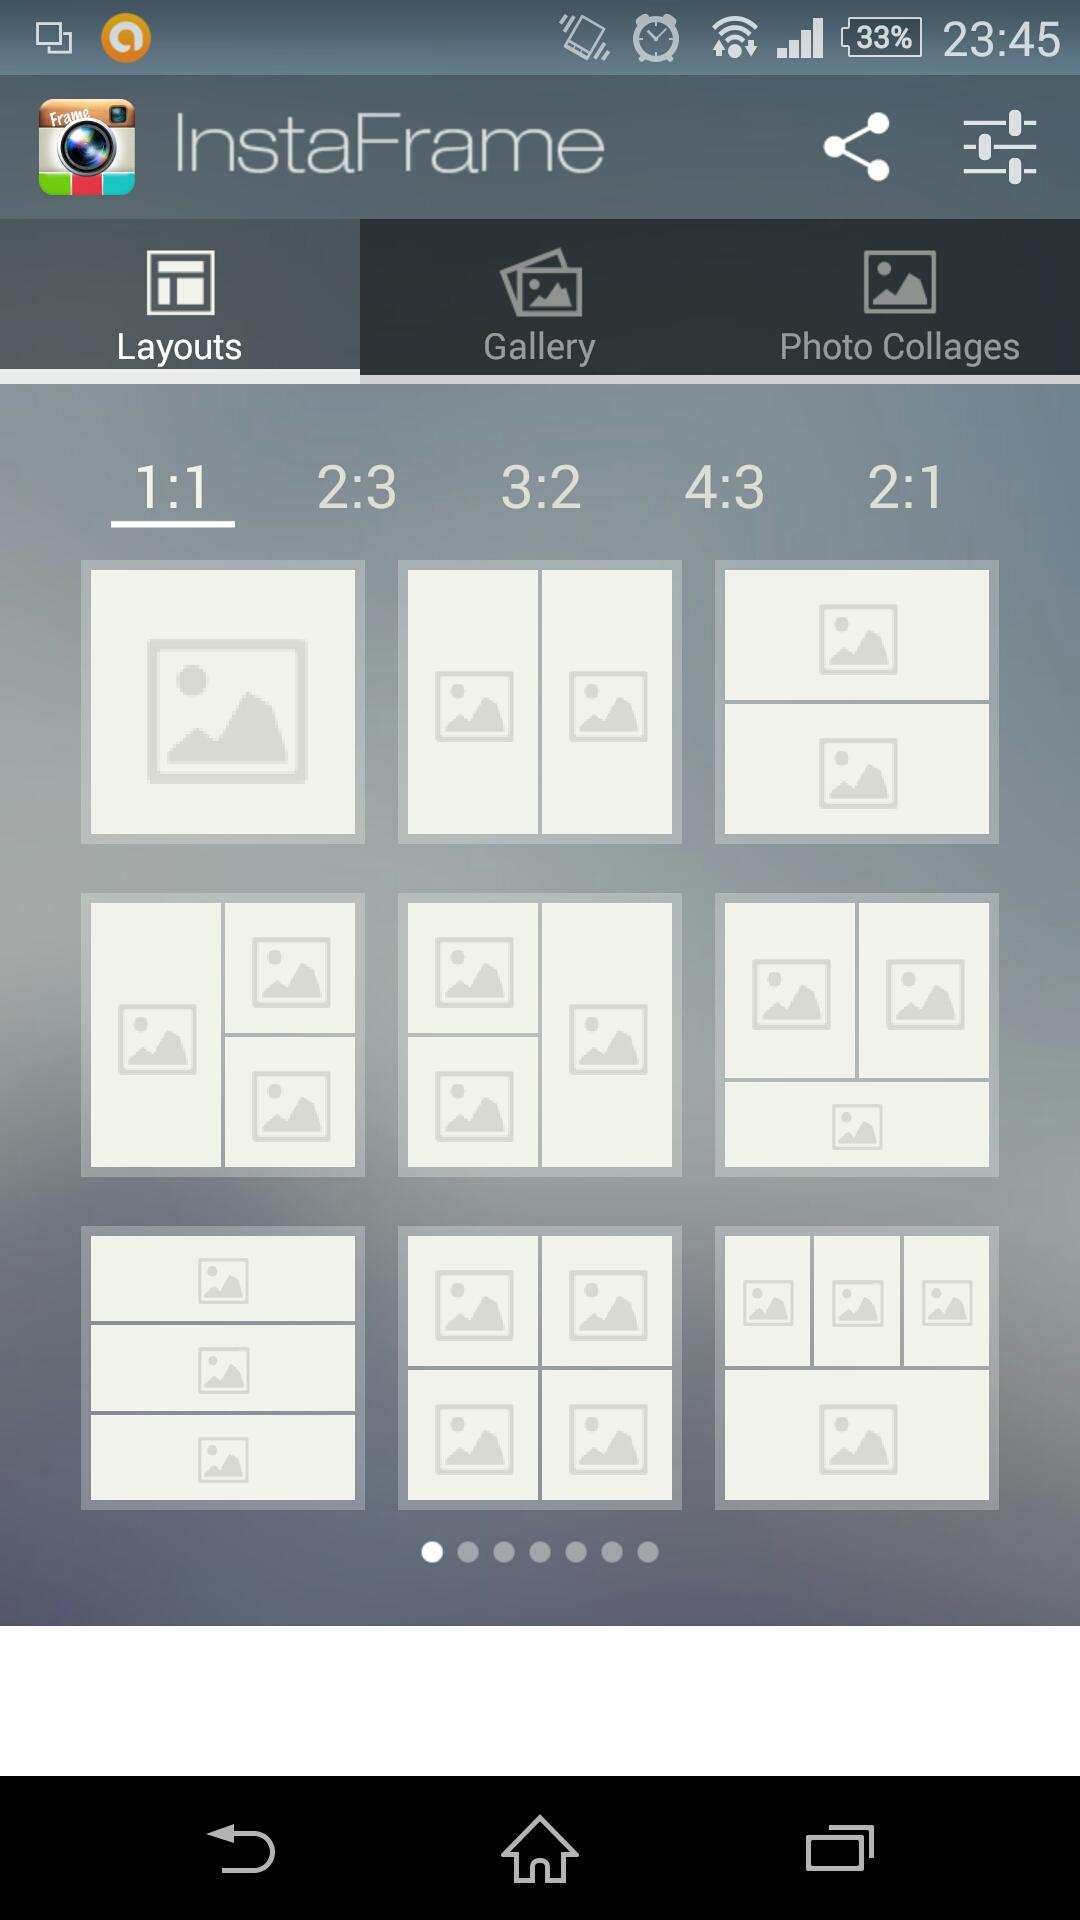 Screenshot_2014-12-16-23-45-38